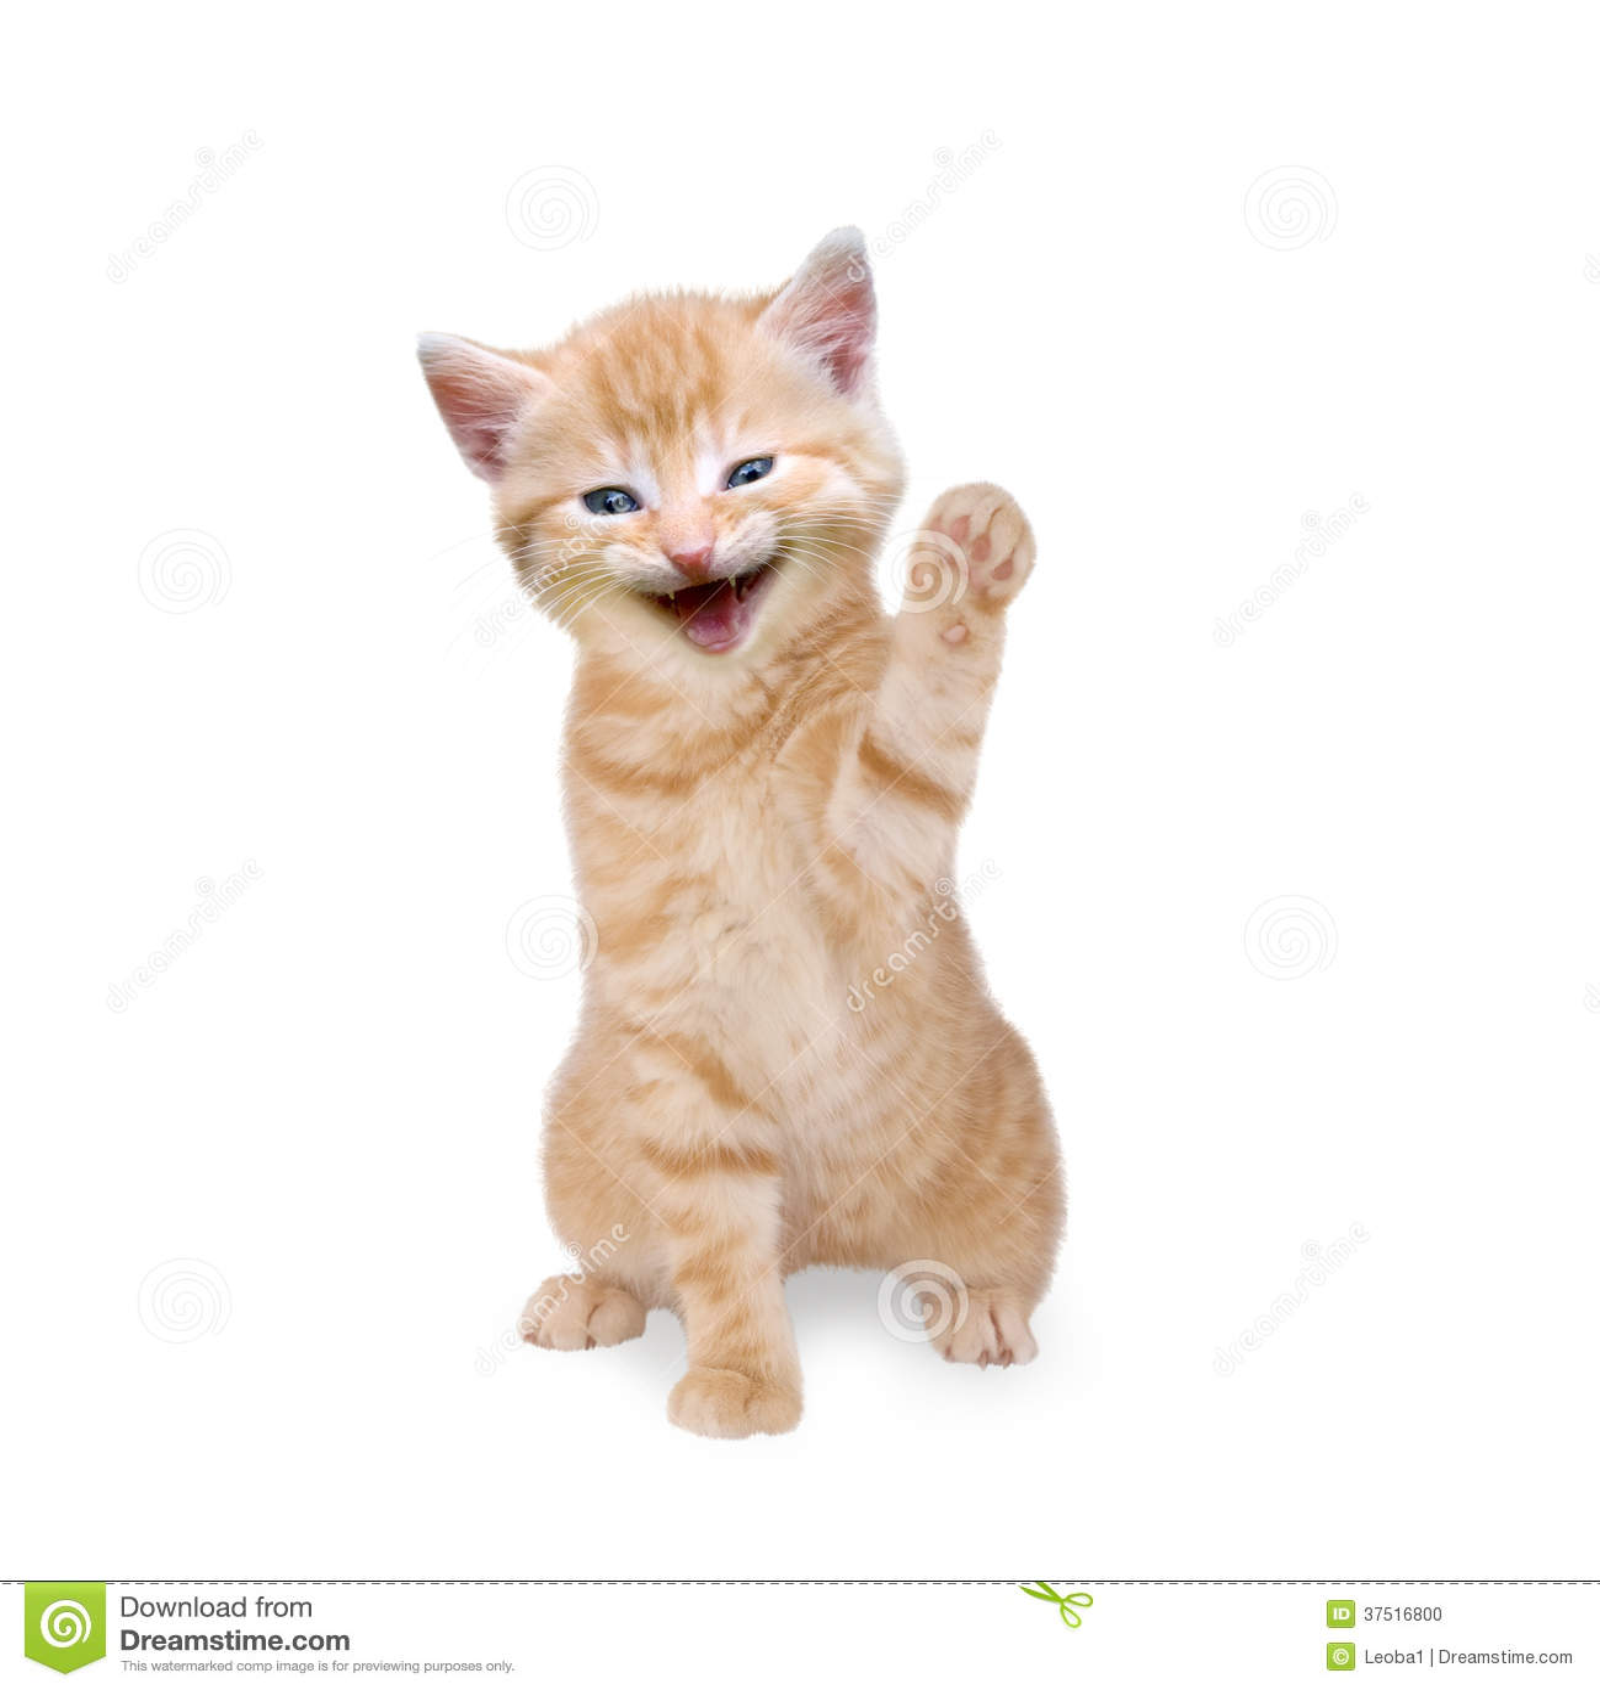 Animated Gif Of Cat Waving